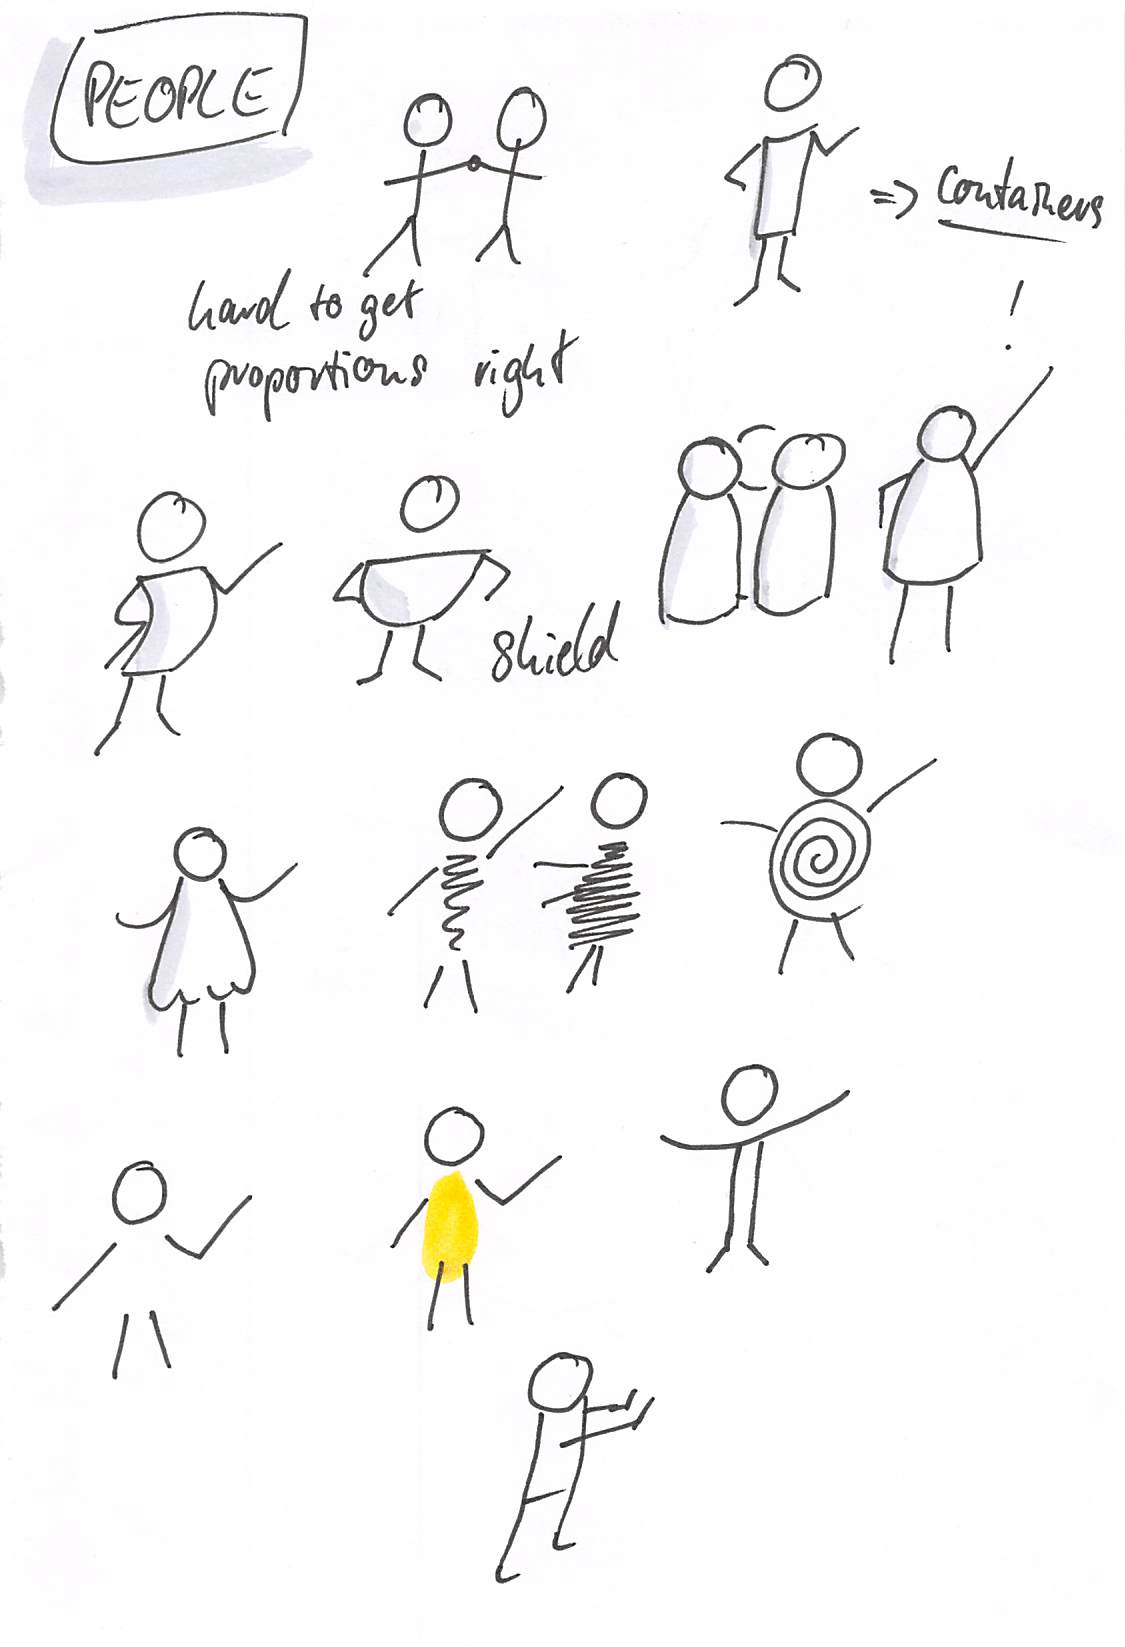 Visual Thinking Skills: Visualization Workshop - People